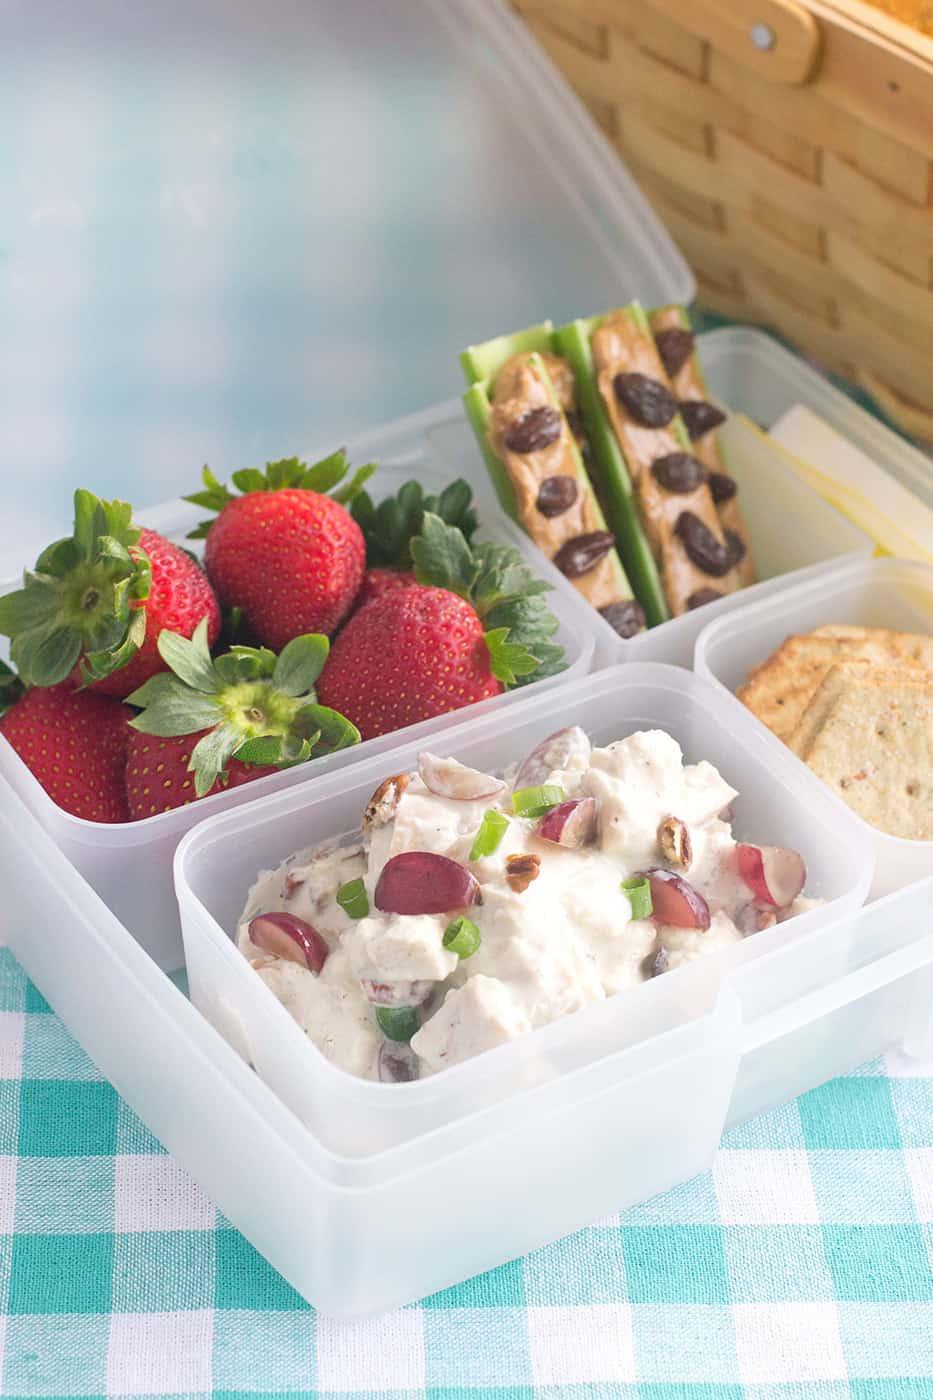 how to make an easy picnic bento box